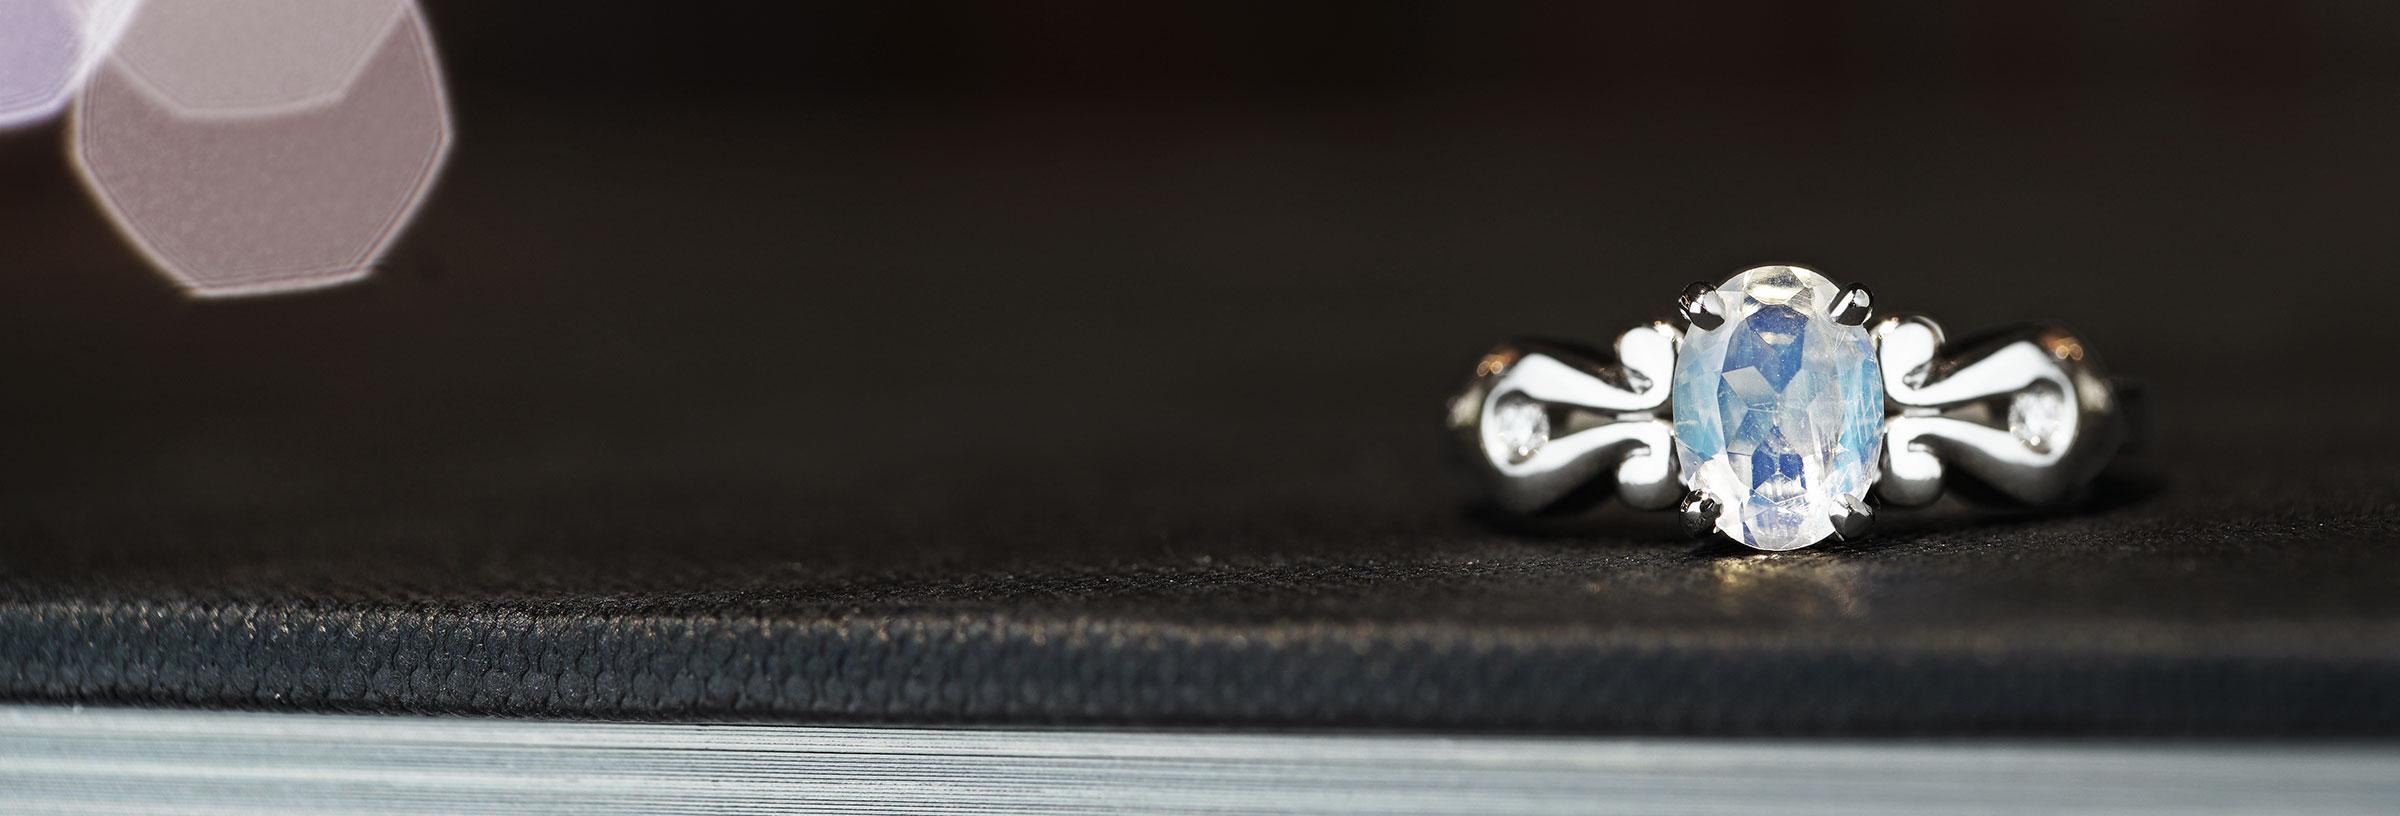 Victorian inspired palladium, moonstone and diamond engagement ring